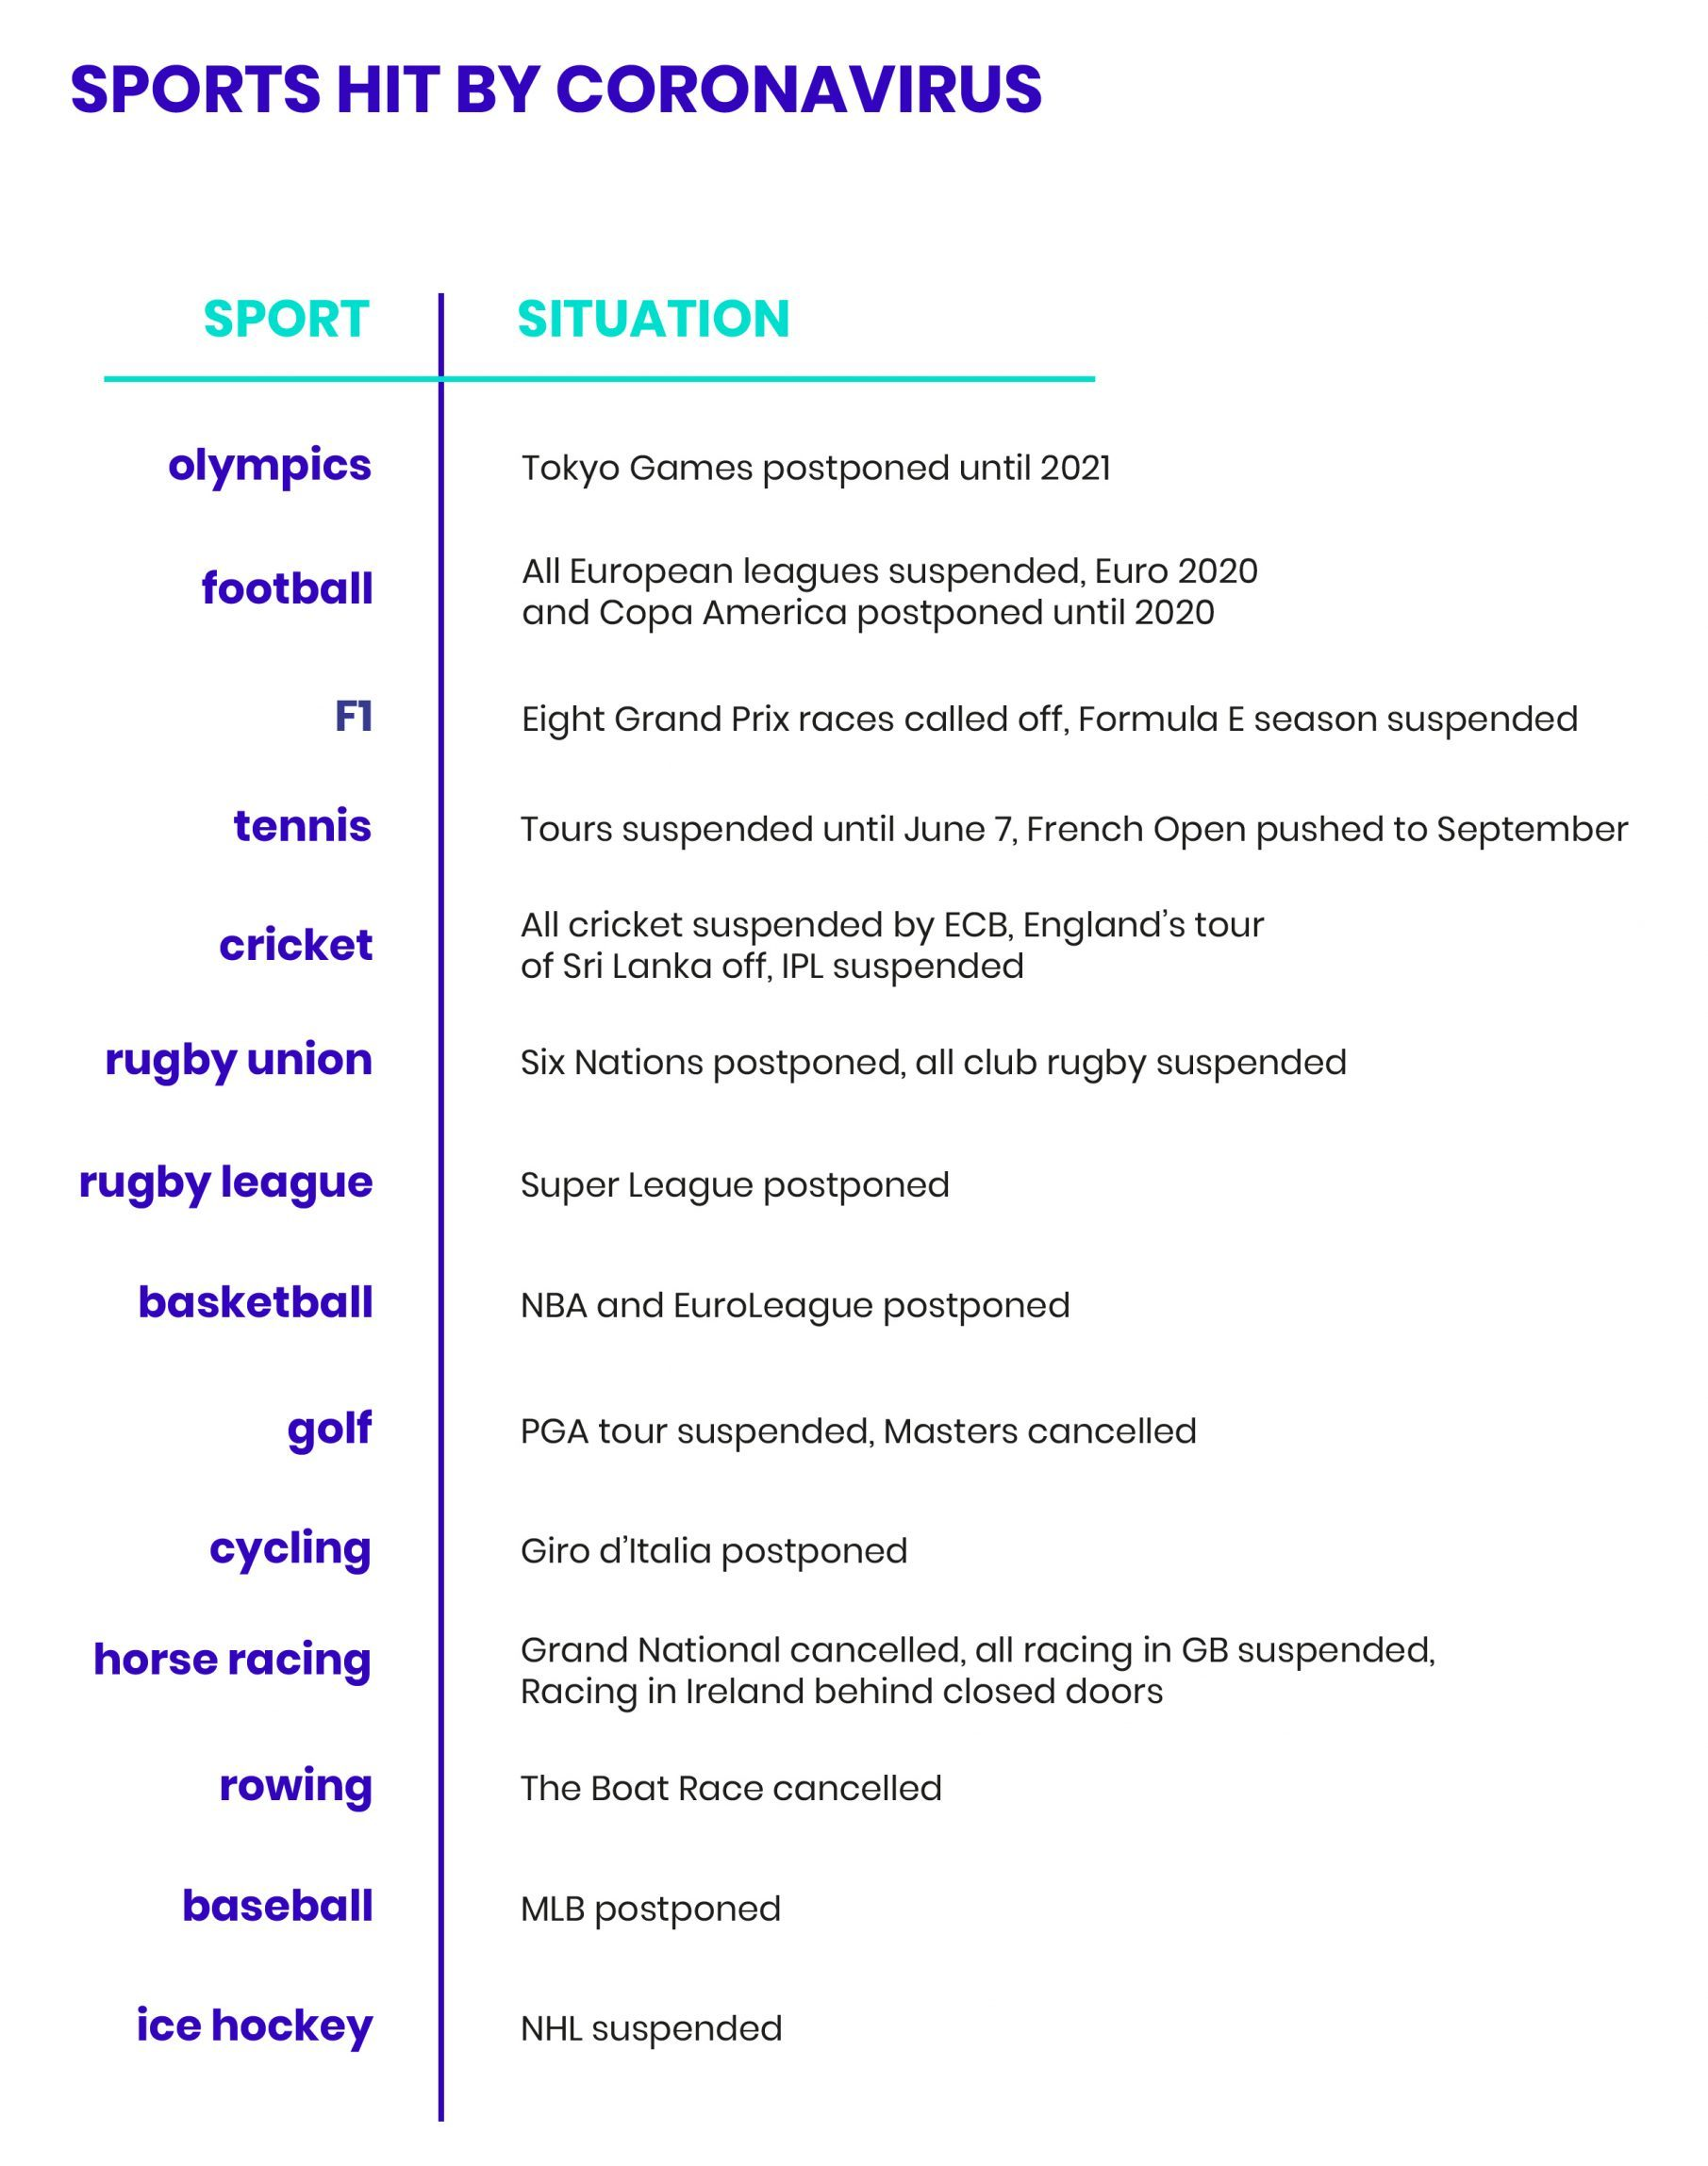 Sport types hit by the coronavirus pandemic